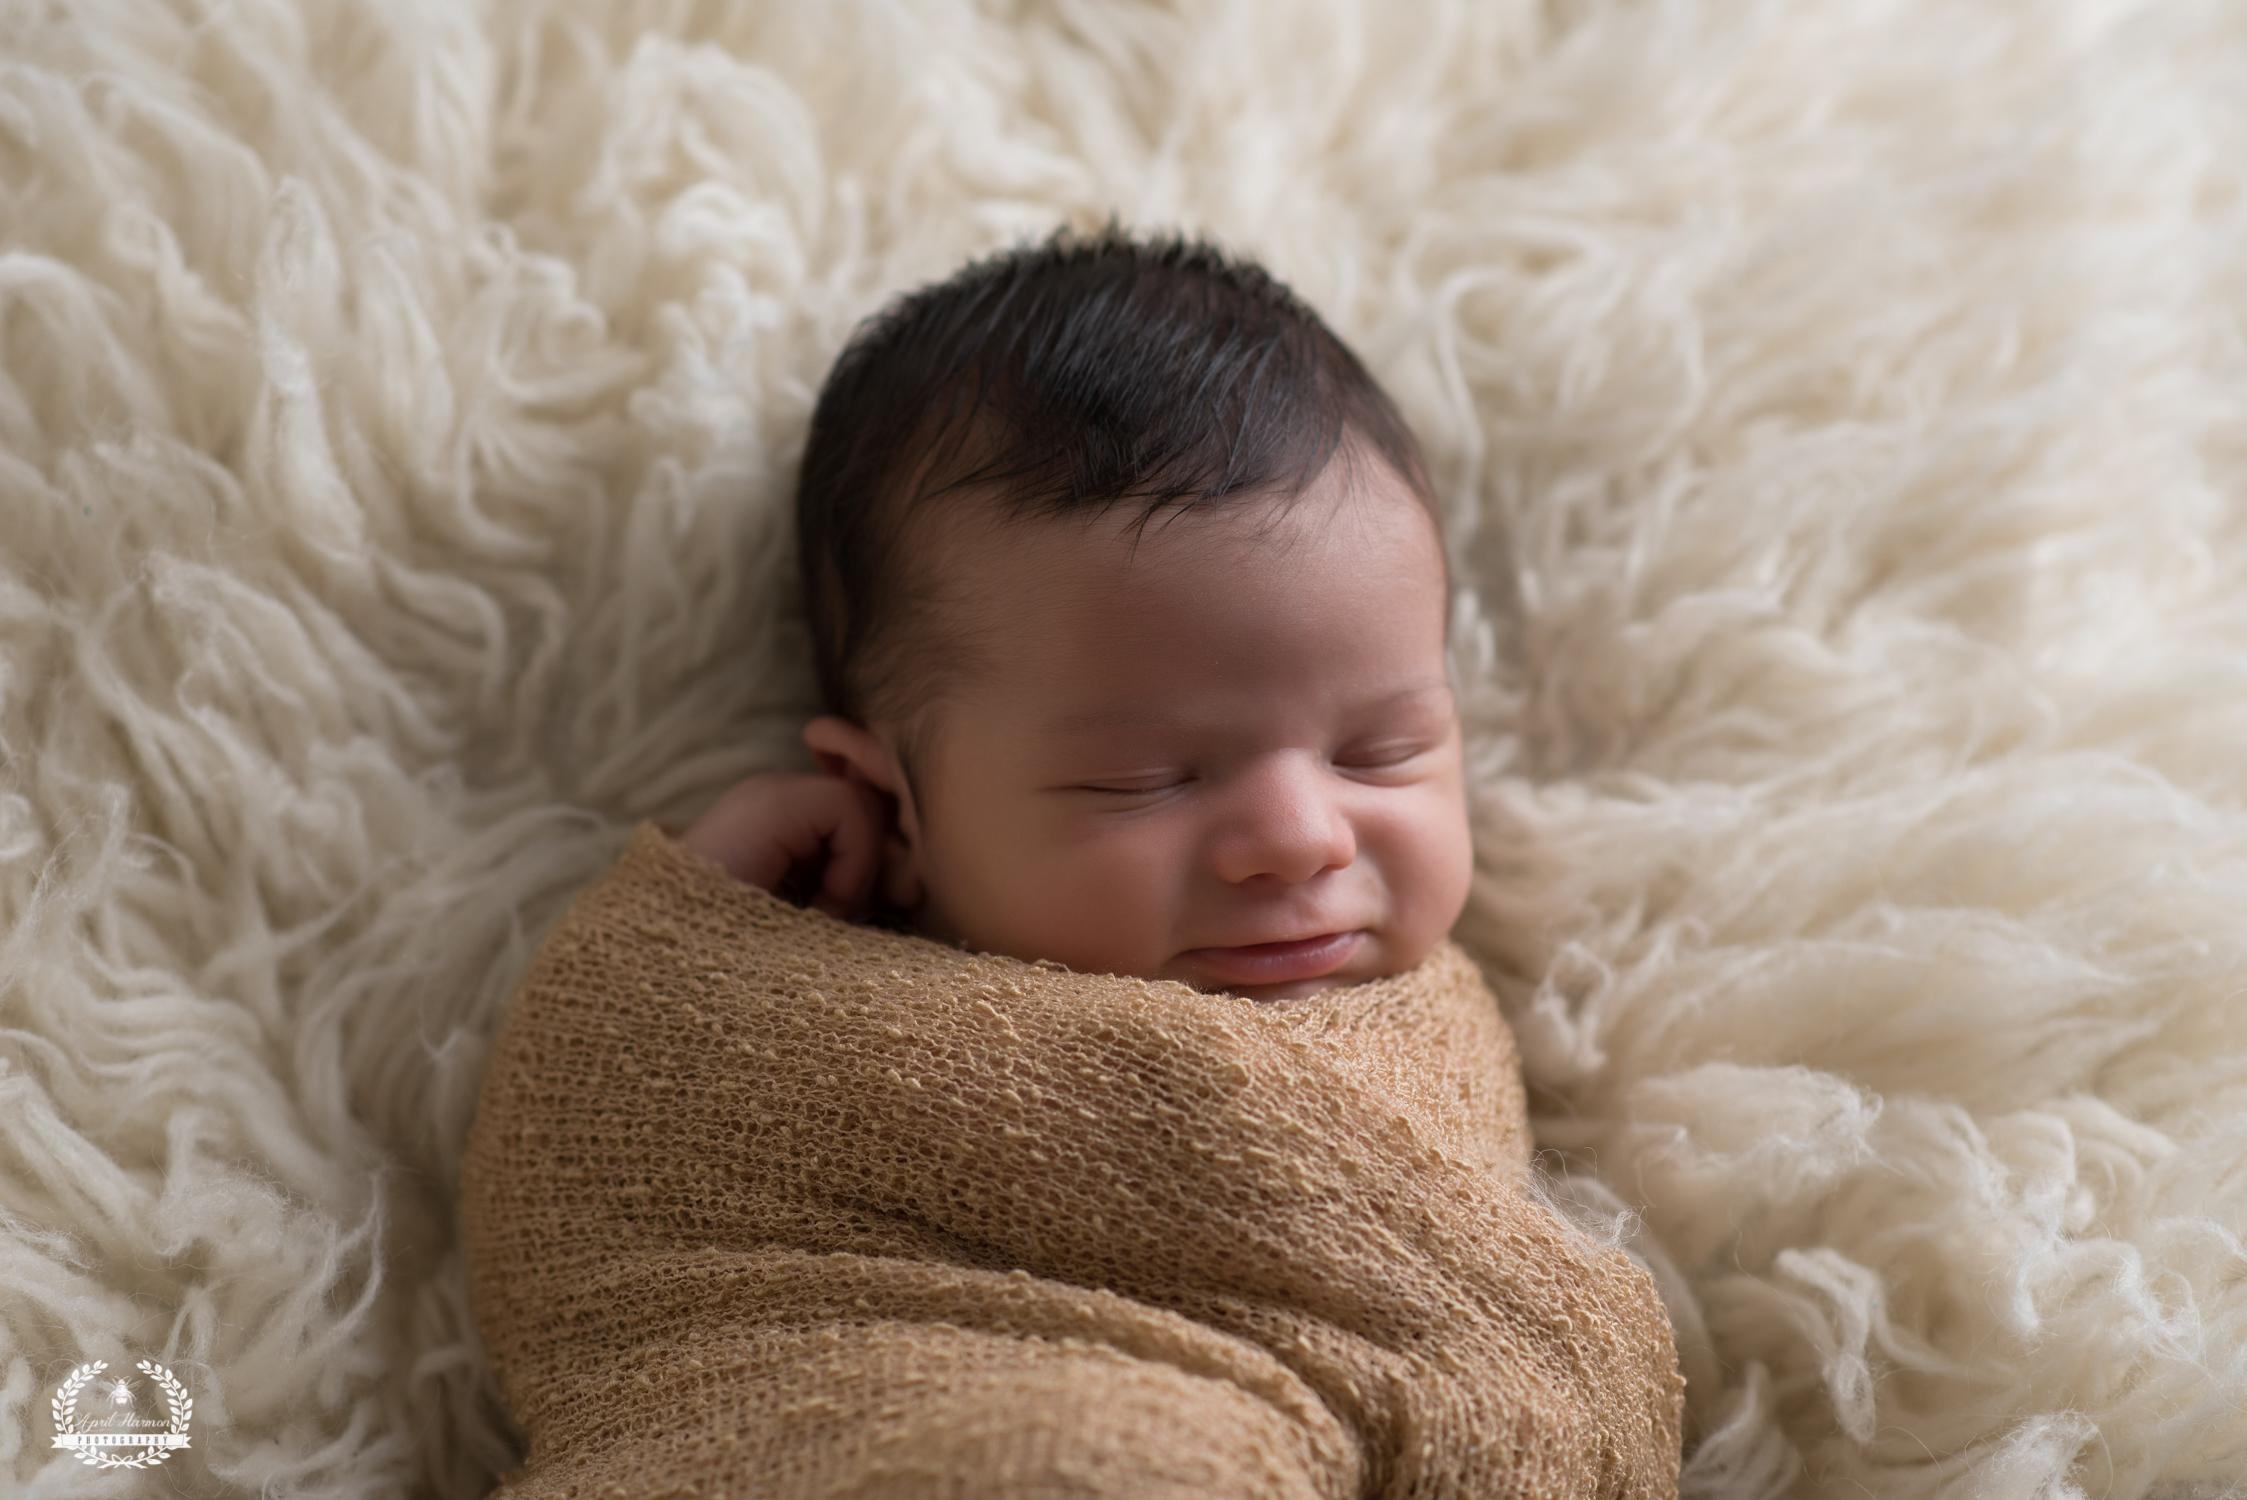 southwest-kansas-newborn-photography8.jpg